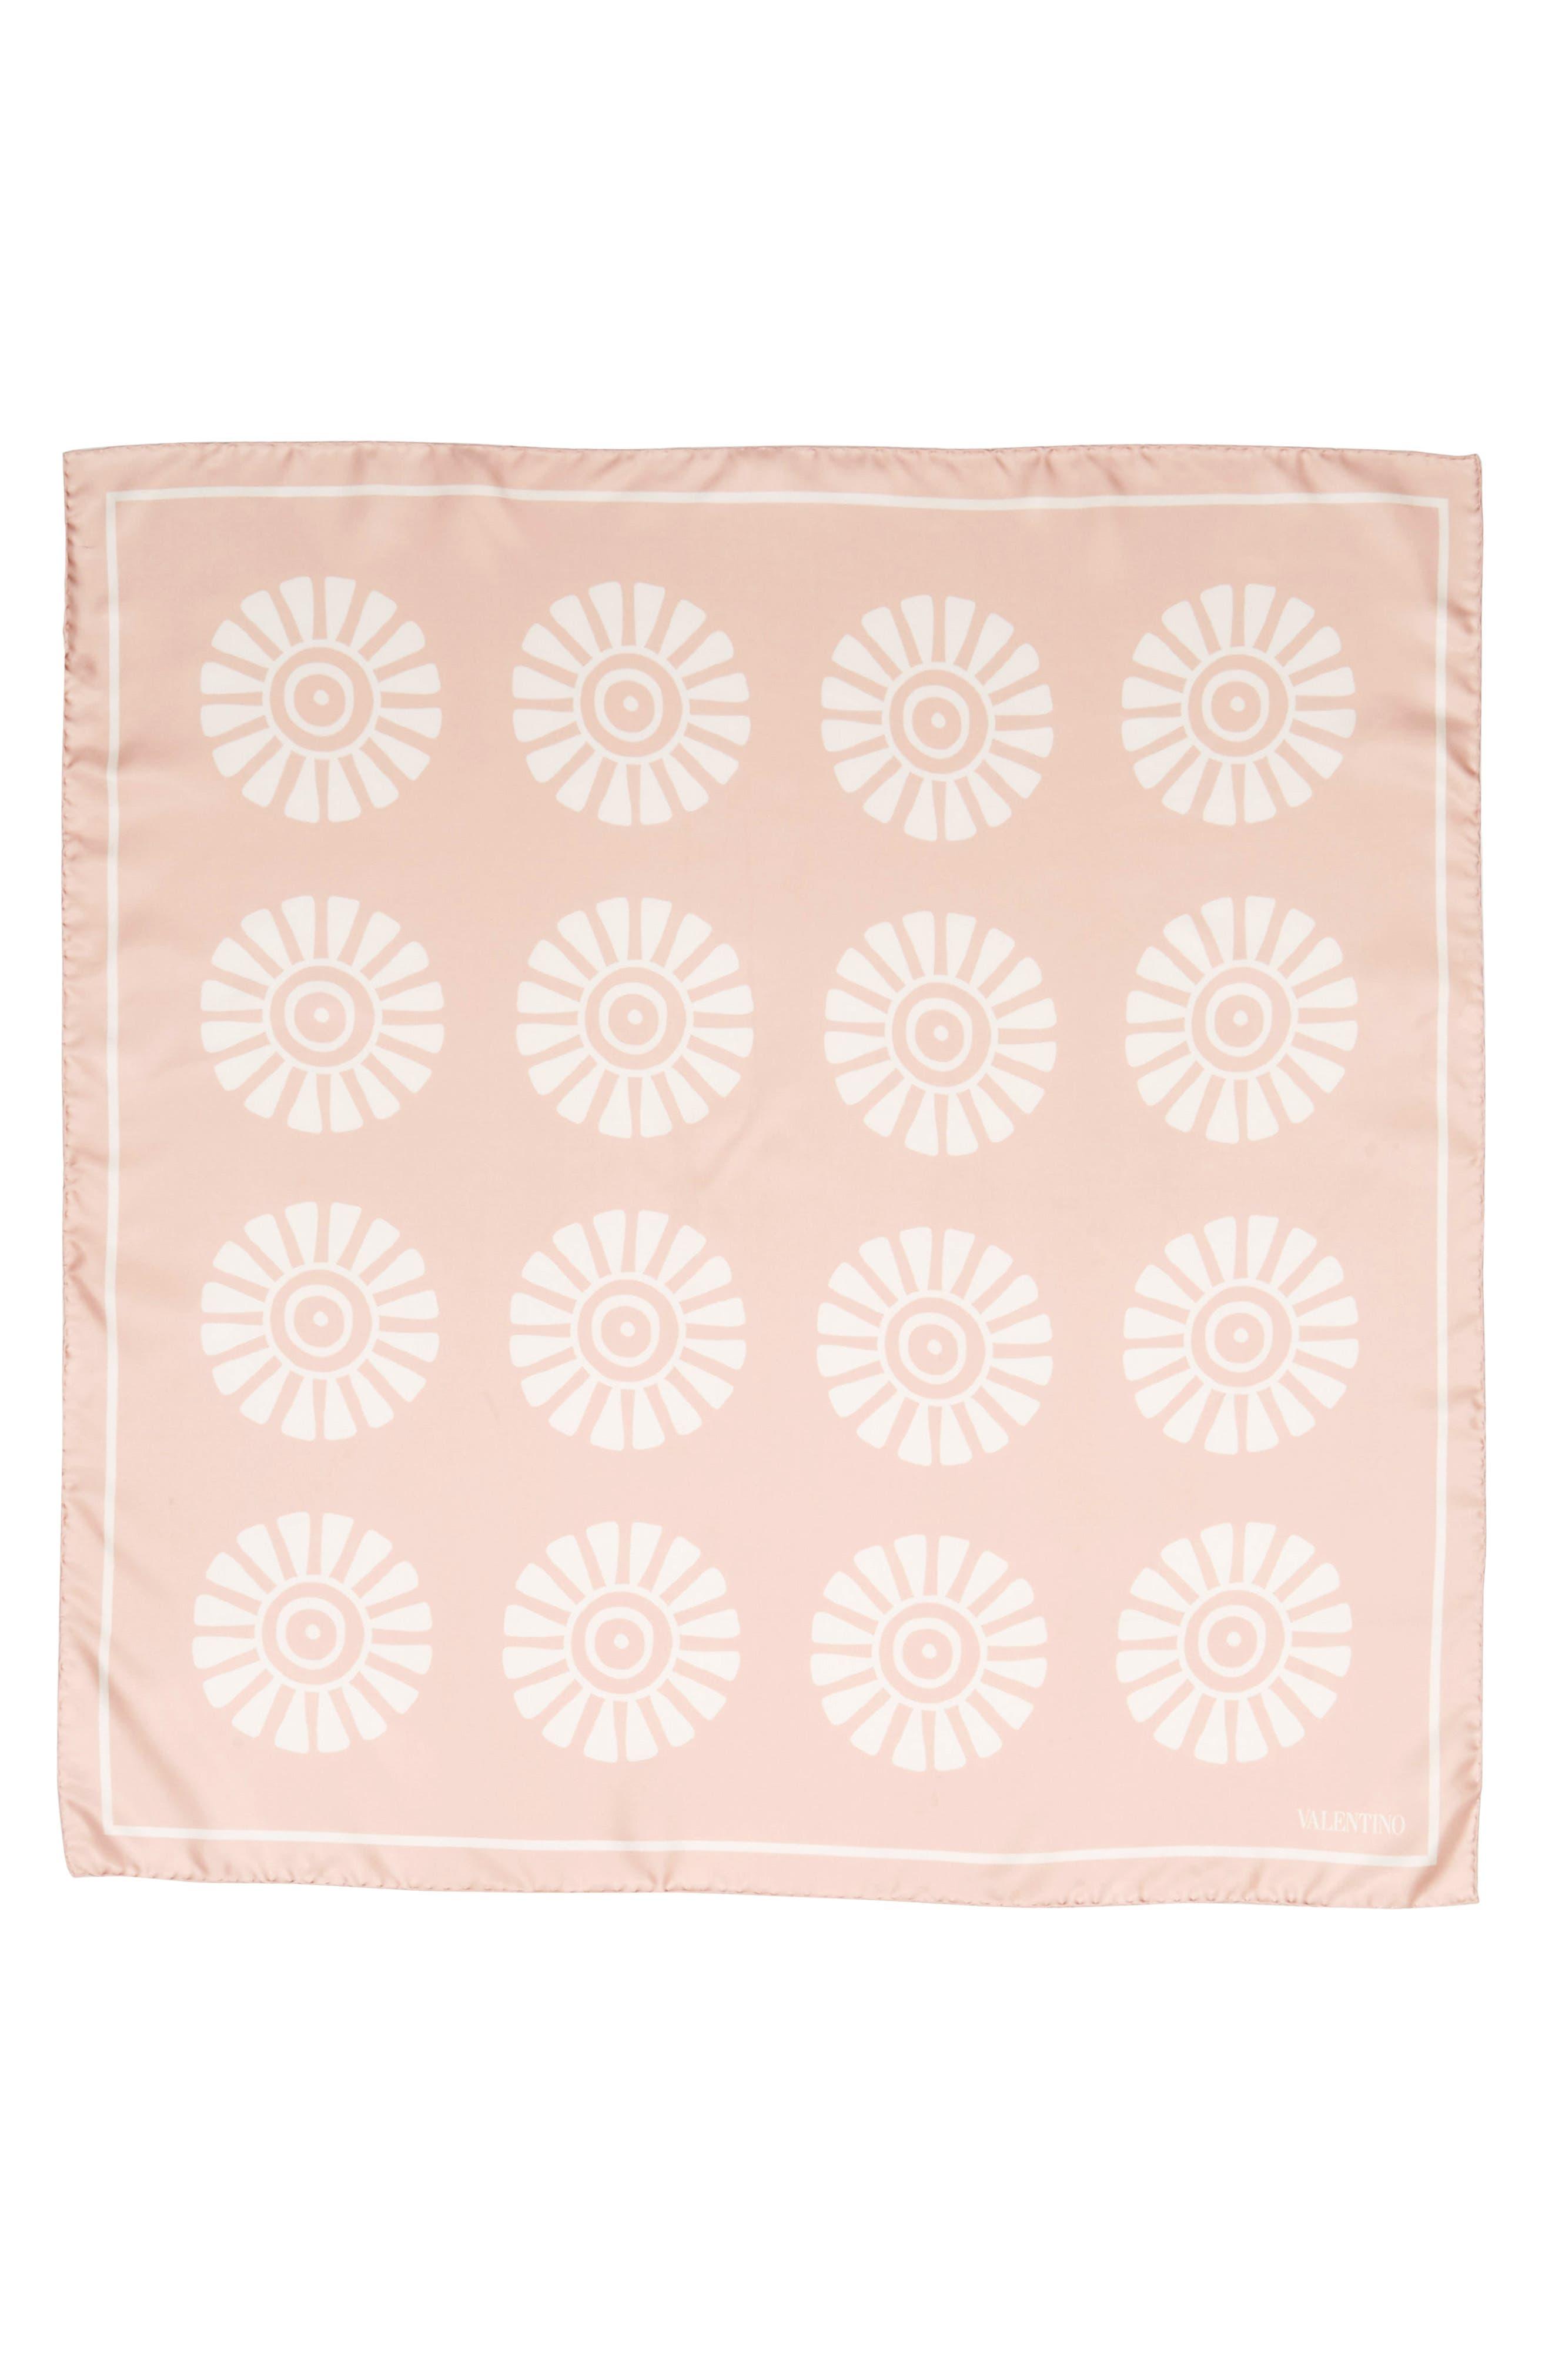 GARAVANI Medallion Print Square Silk Scarf,                         Main,                         color, 0Lz Rose Mist